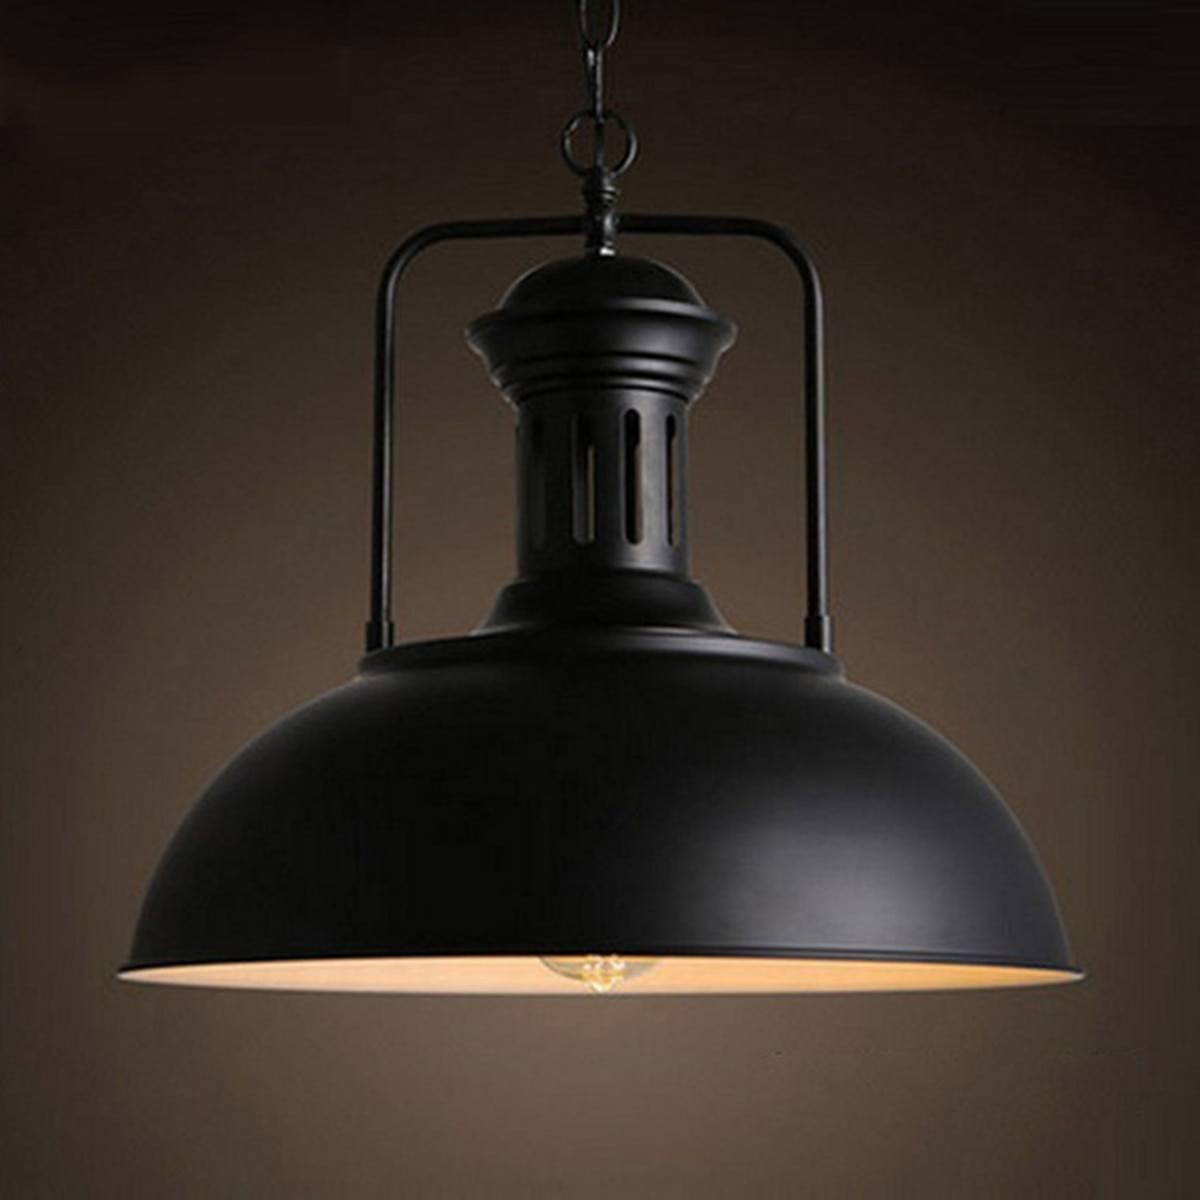 Black Rust Design Pendant Lighting Lighting Fixtures & Accessories e607d9e6b78b13fd6f4f82: Black|Rust